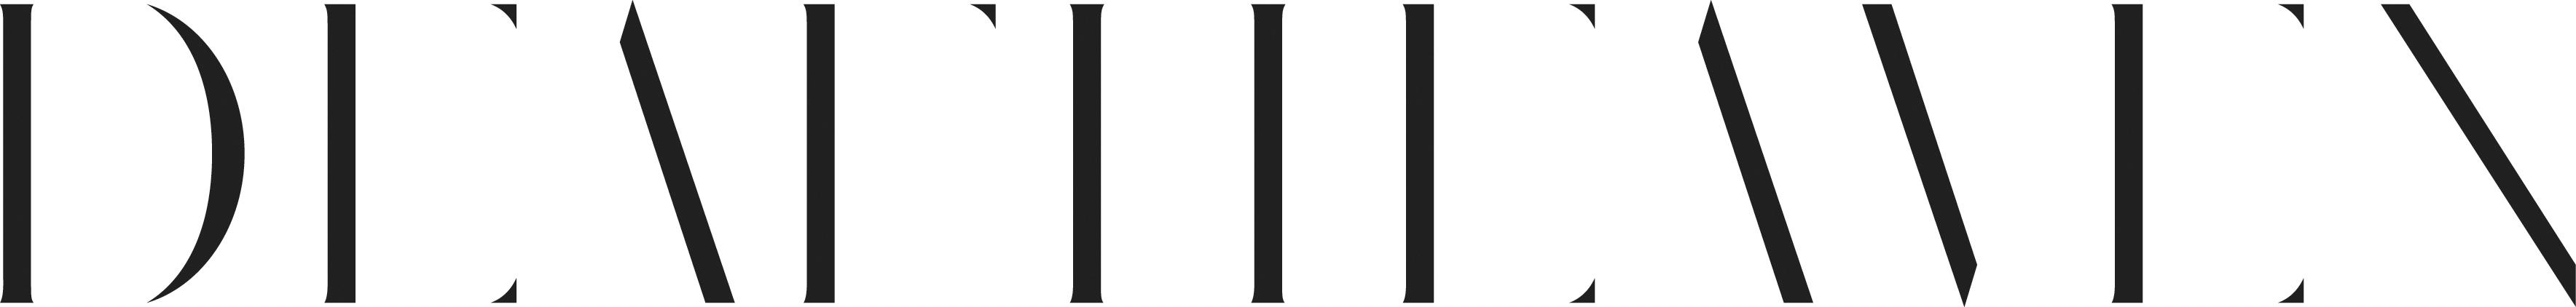 Deafheaven_Logo_F_Black_hi.jpg